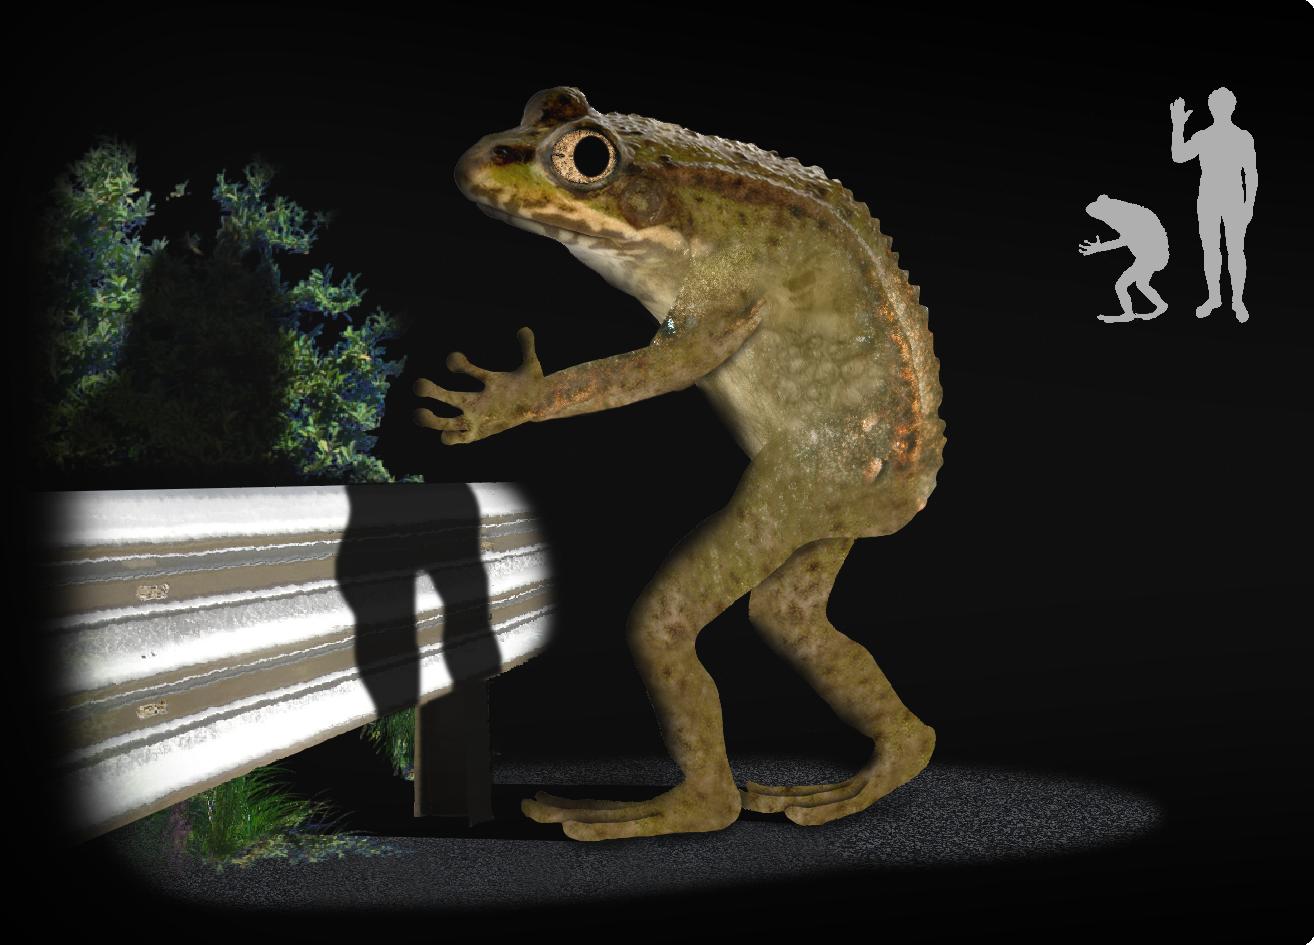 loveland frogman illustration